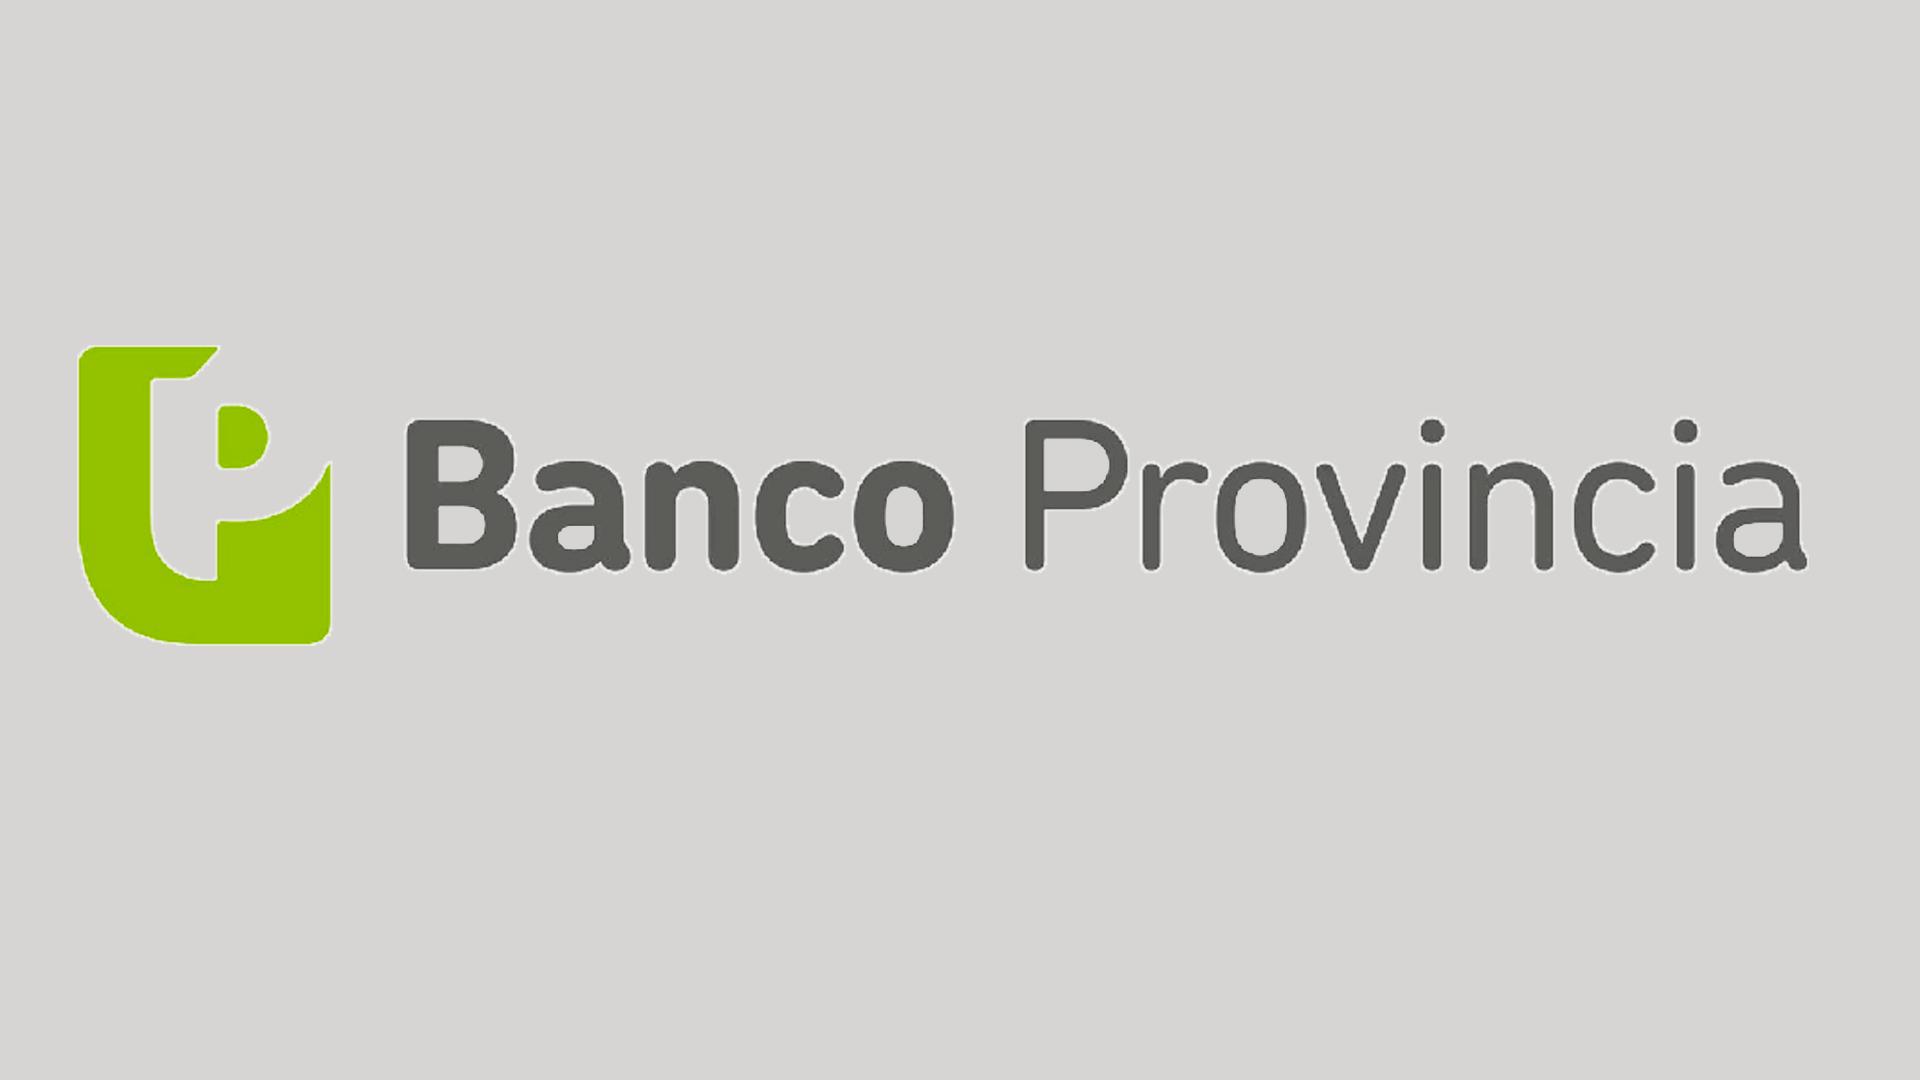 banco provincia plazos fijos